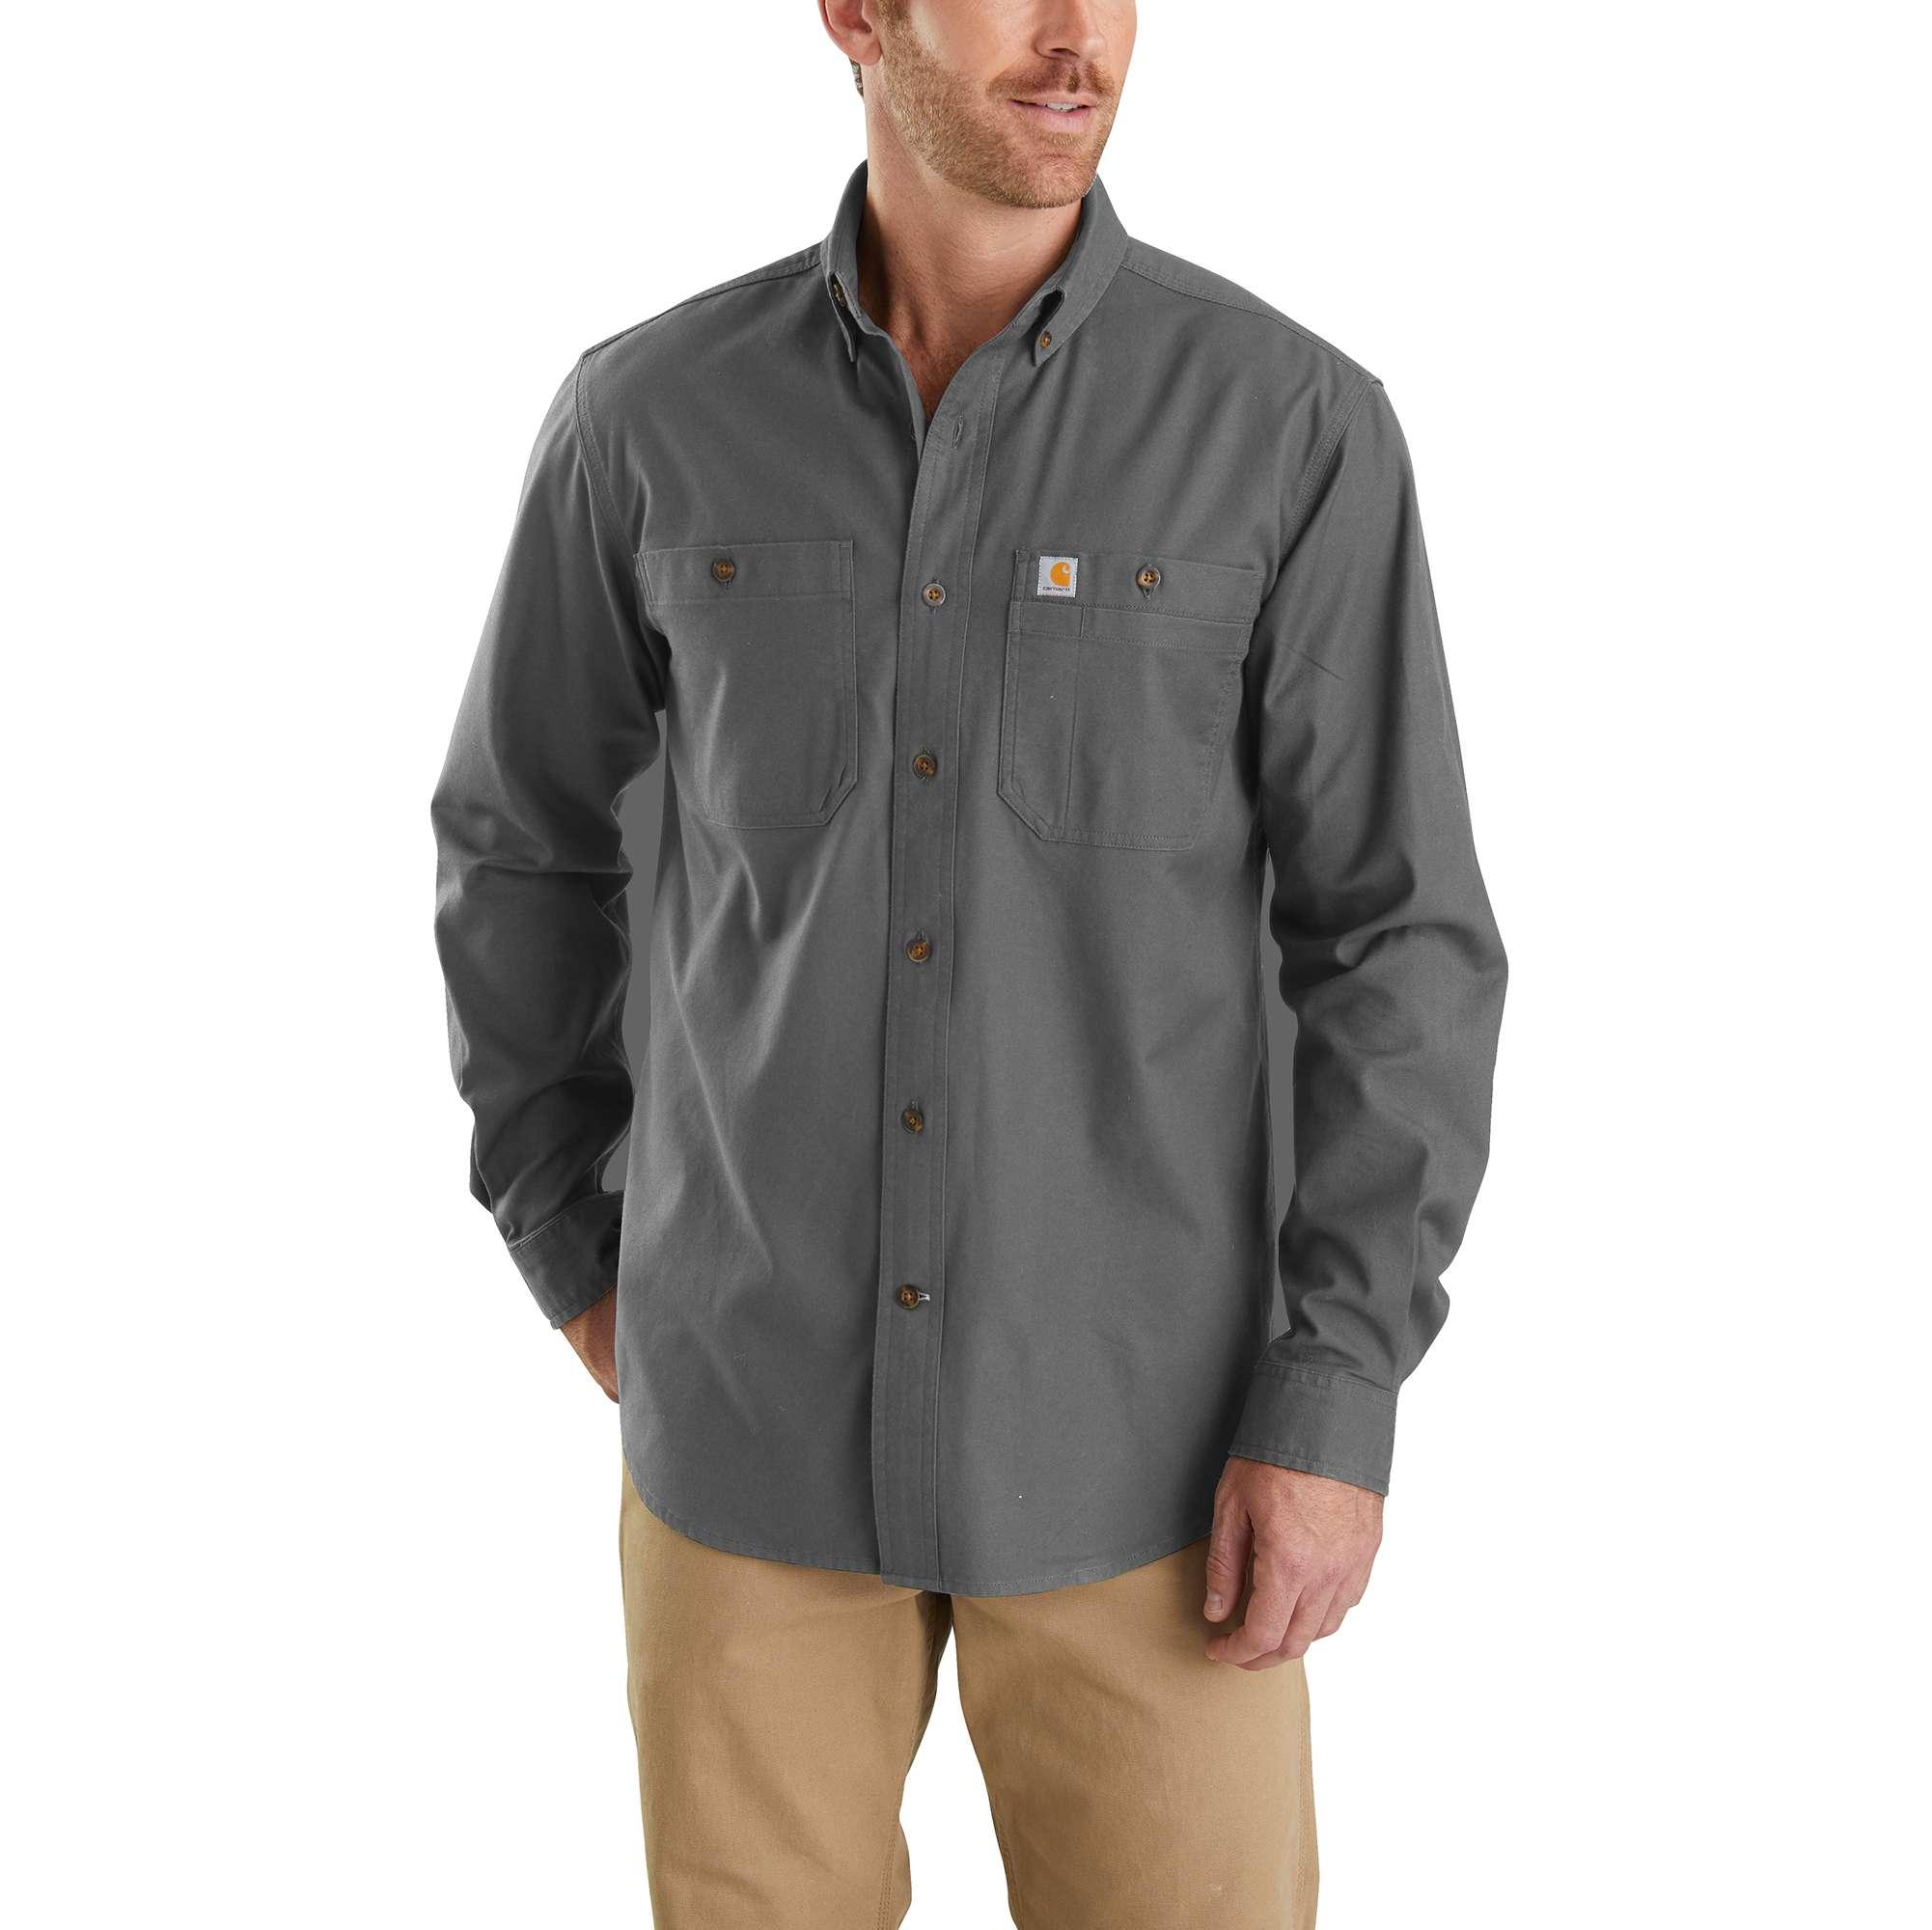 Rugged Flex Rigby Long-Sleeve Work Shirt